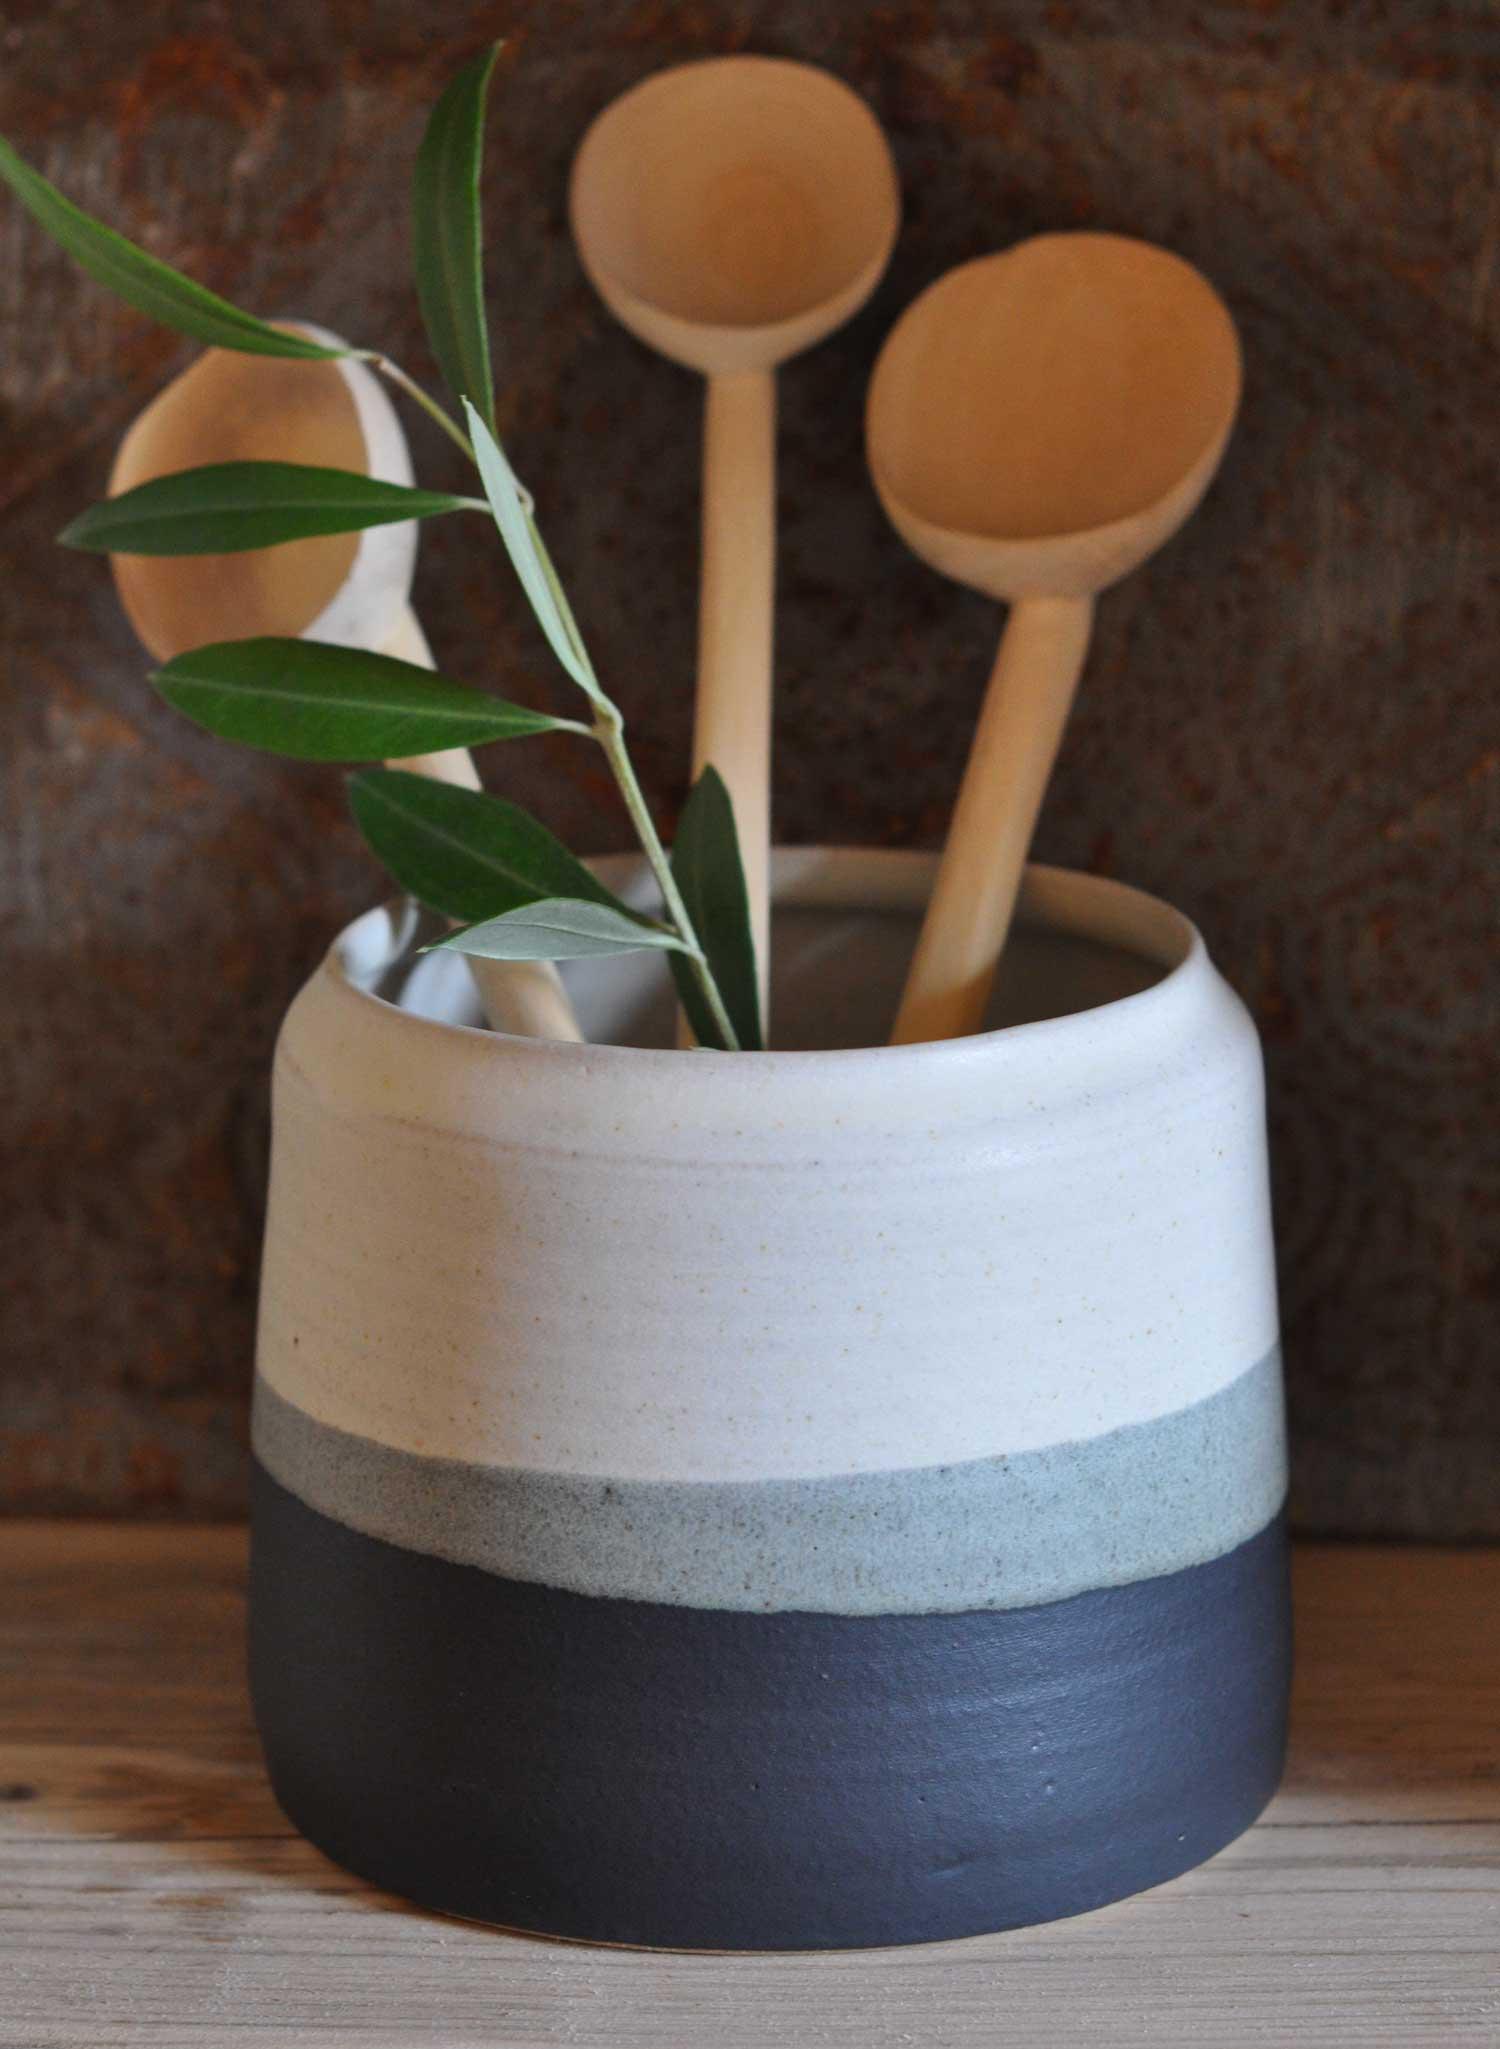 Hand-thrown utensil pot by Hilda Carr - Home Barn Vintage